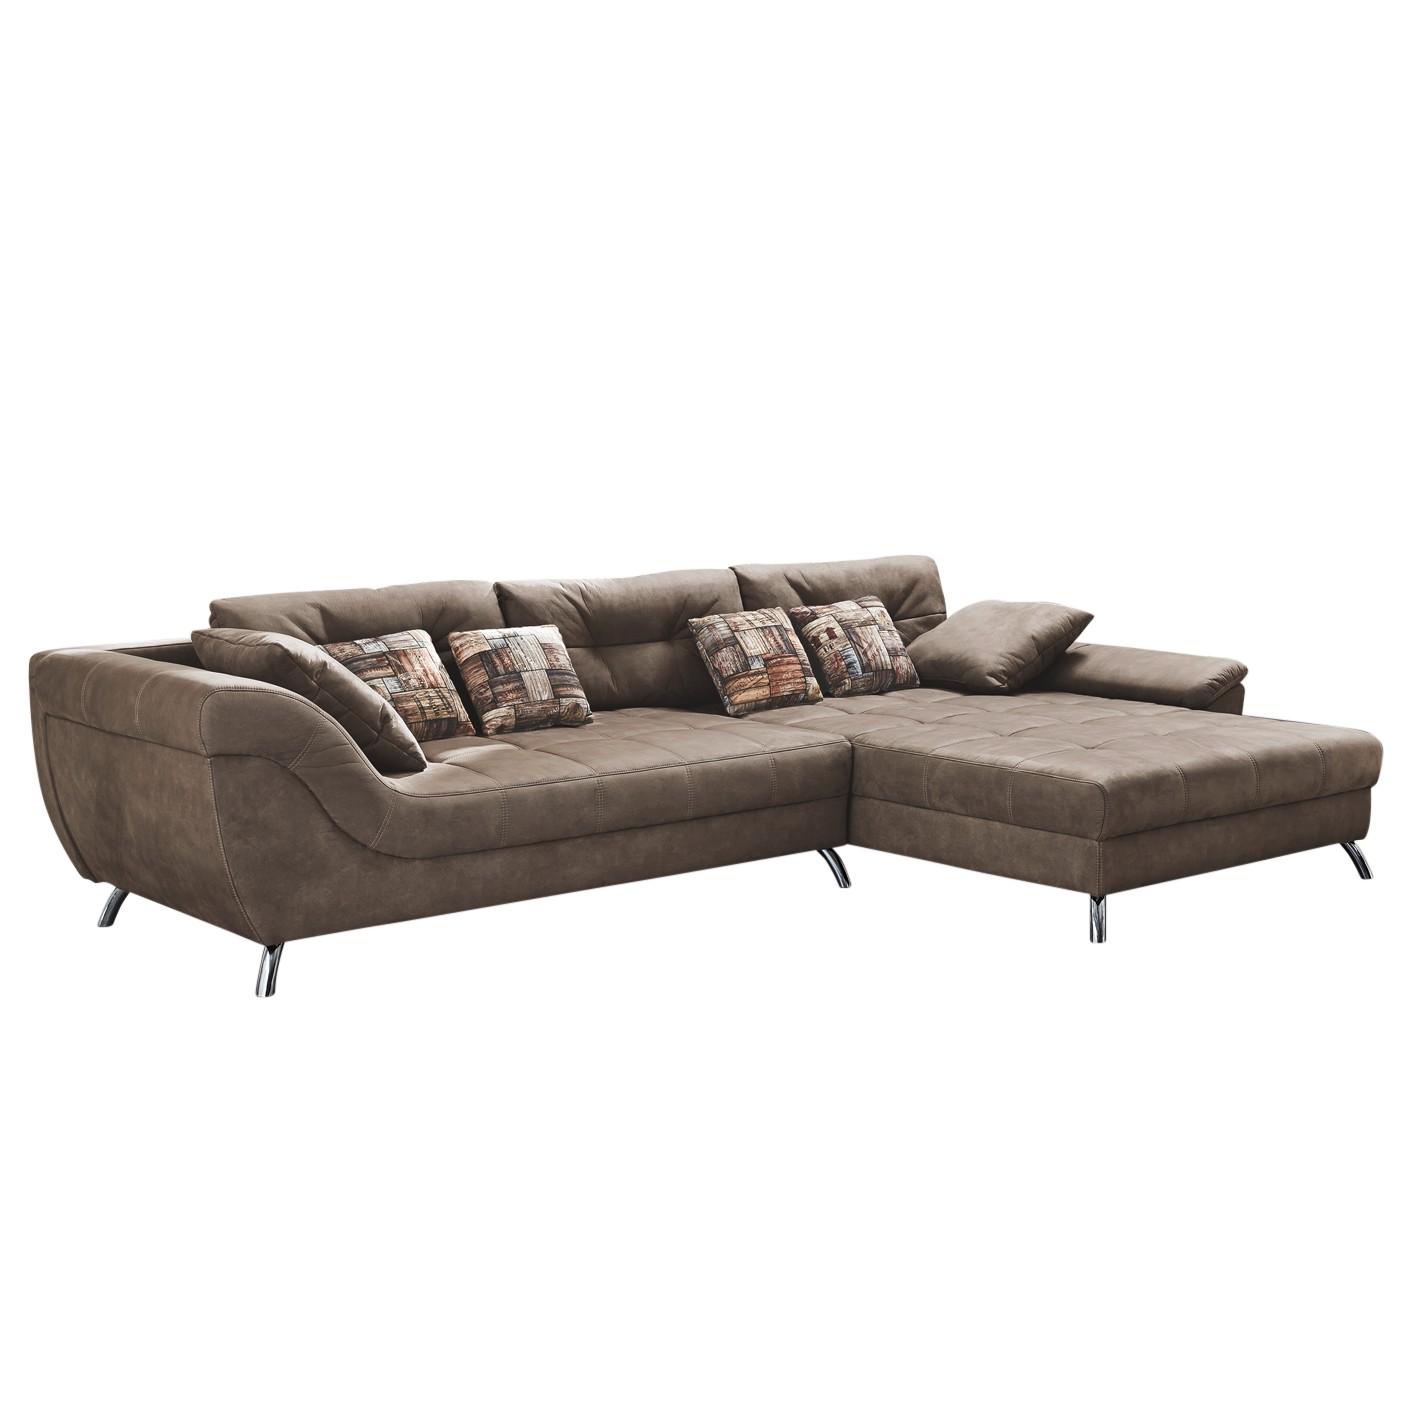 Canapé d'angle Merizo